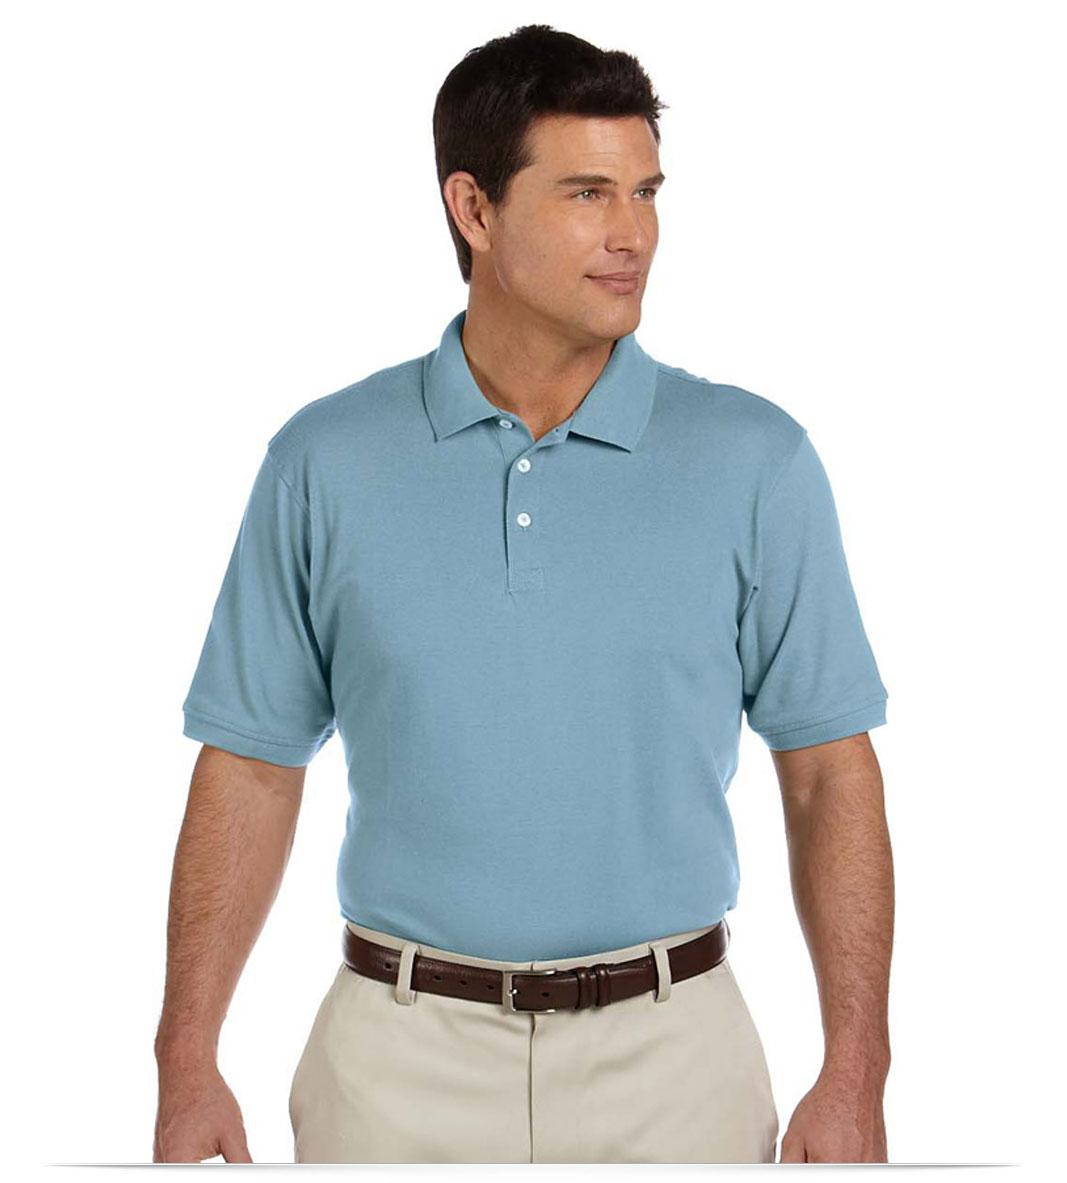 Design custom harriton 100 cotton business polo shirt online for Custom company polo shirts